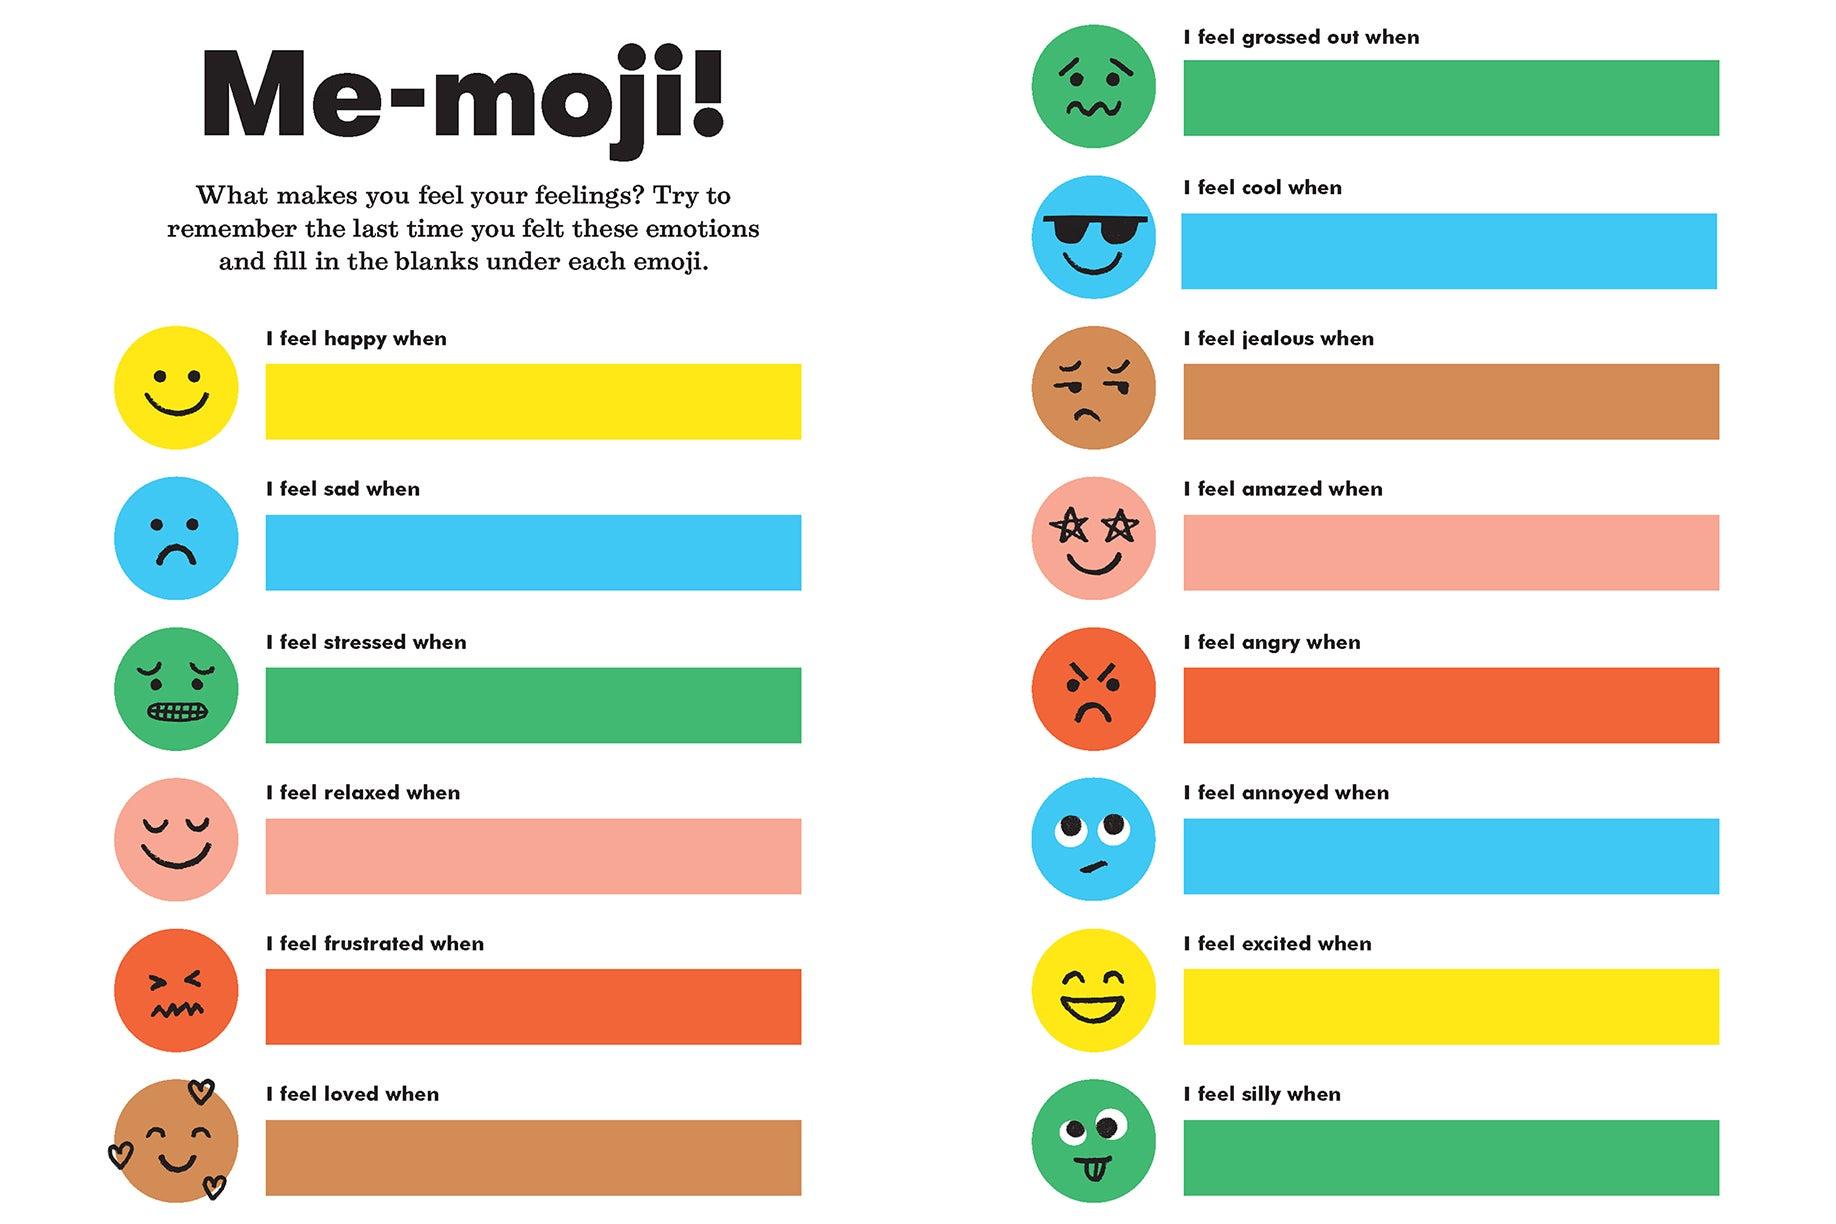 Me-moji mood chart